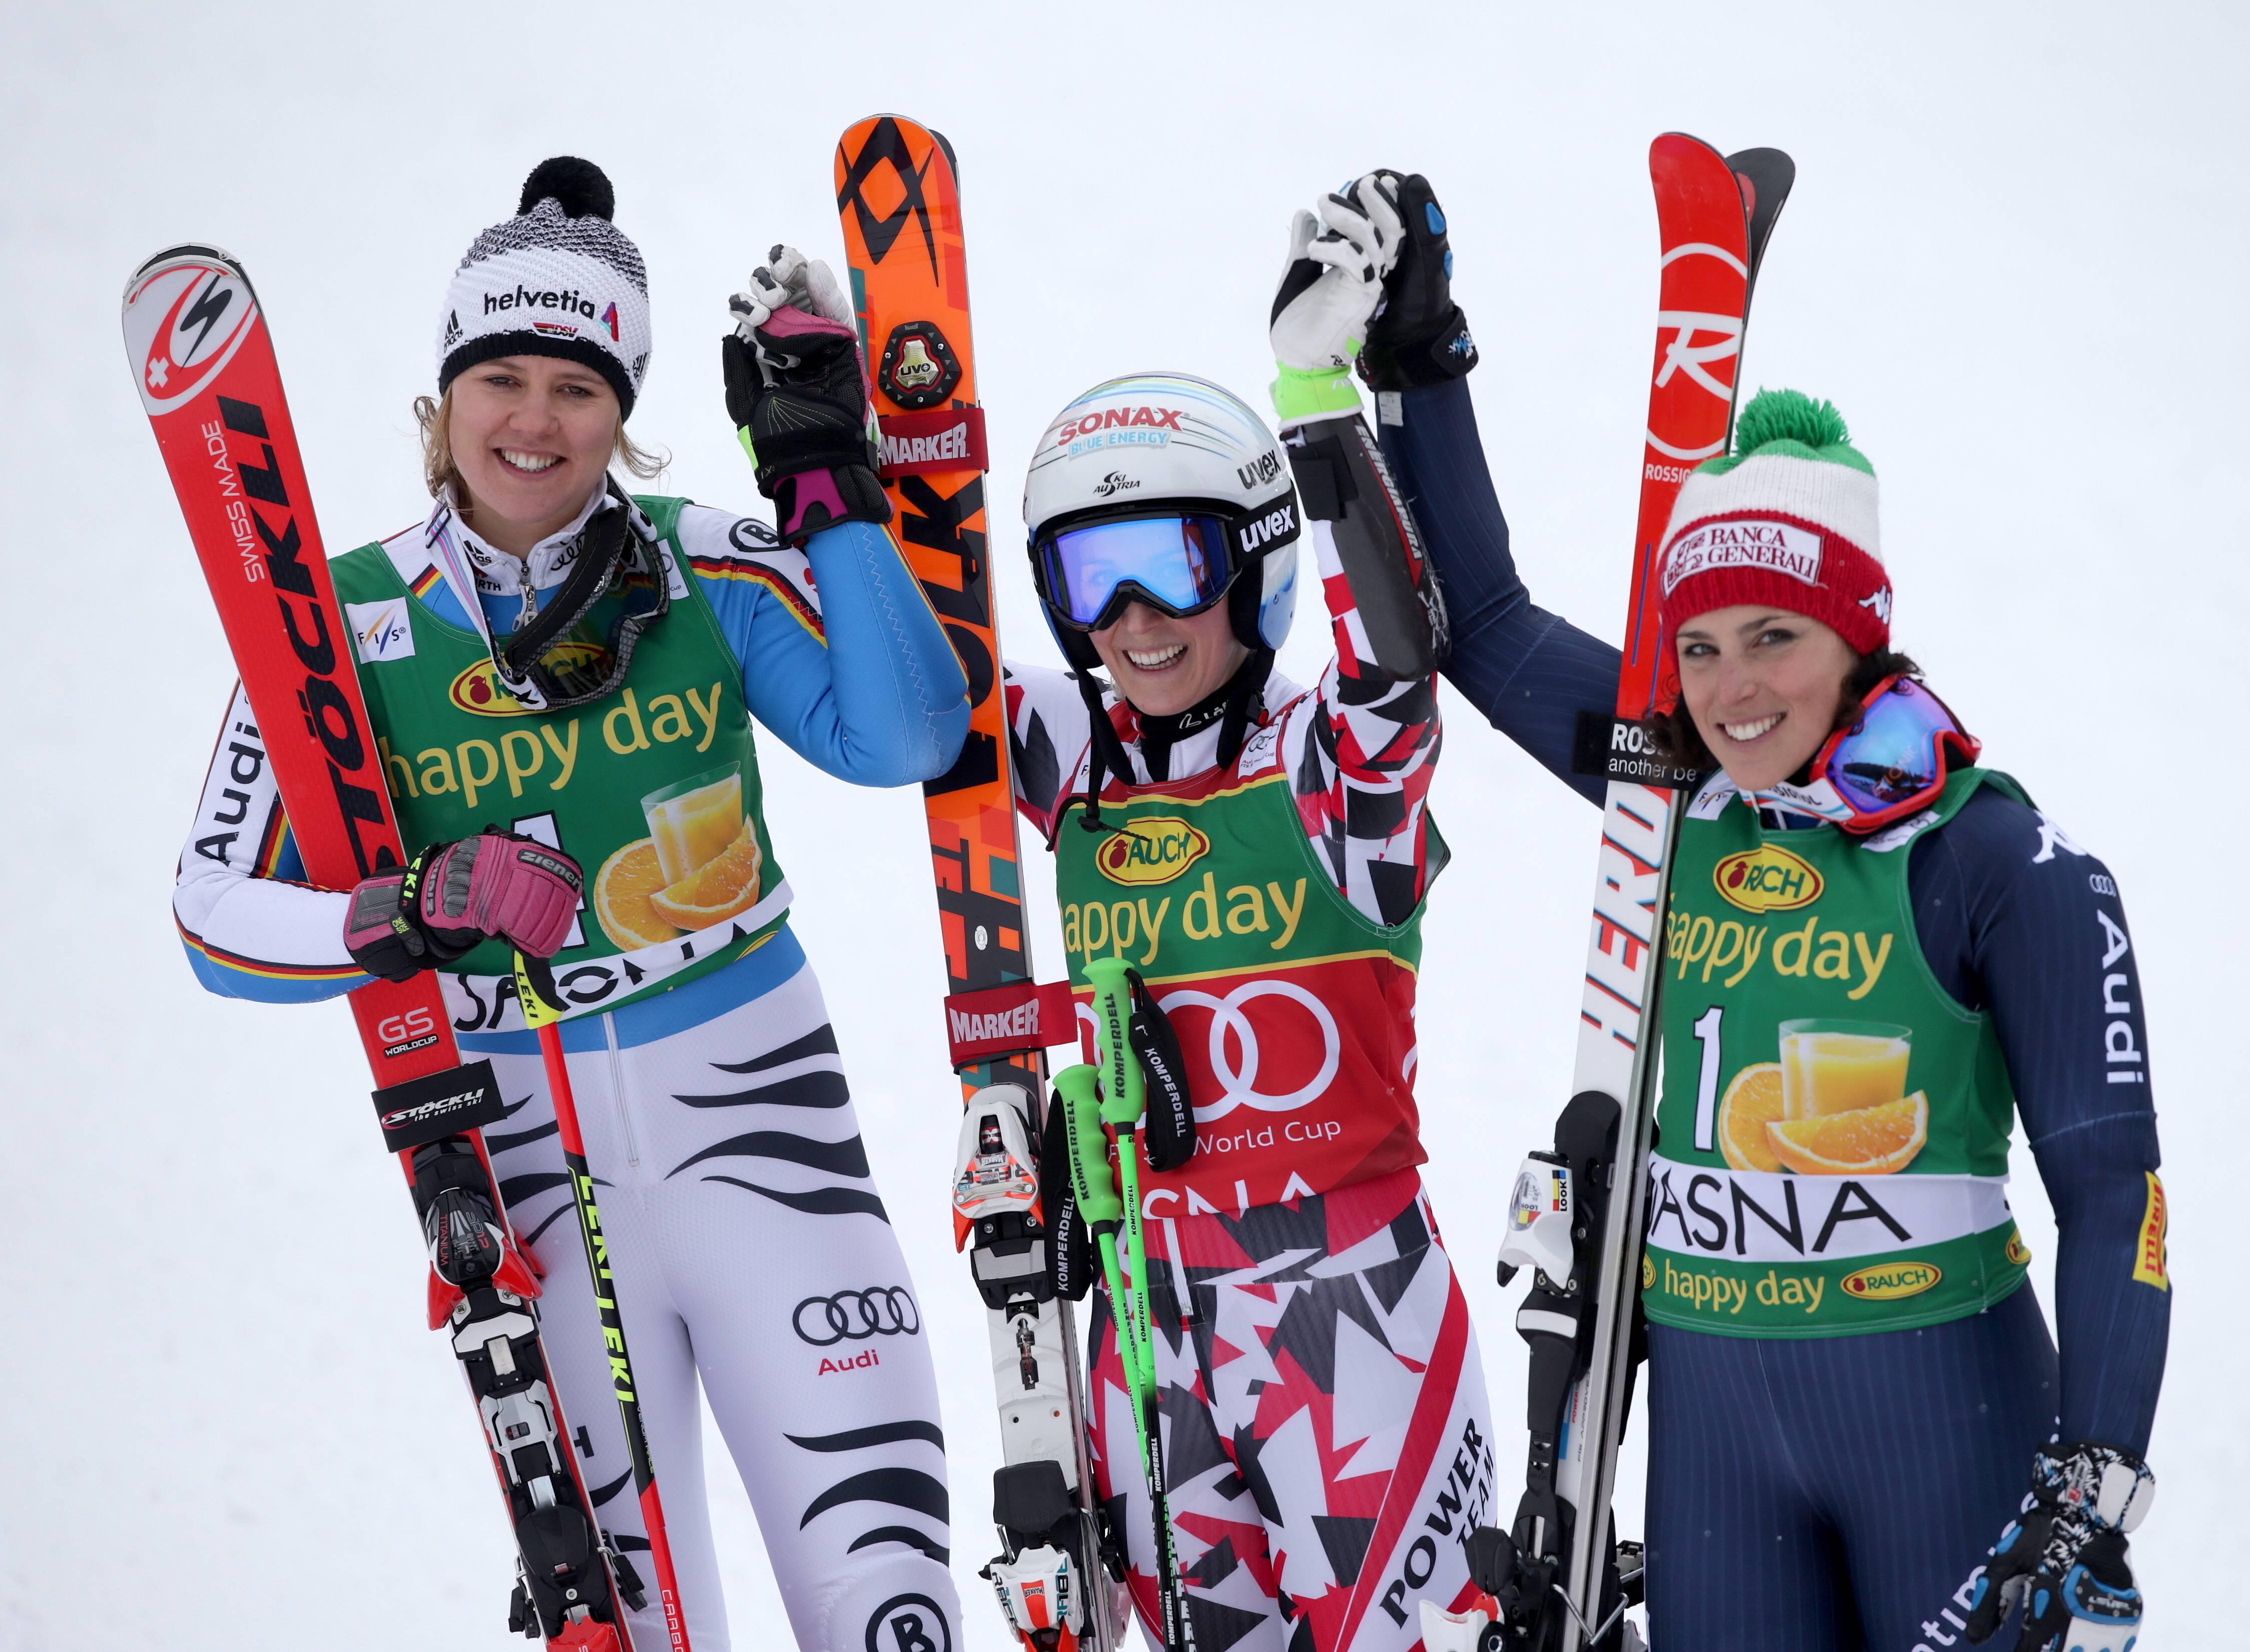 ALPINE SKIING - FIS WC Jasna JASNA,SLOVAKIA,07.MAR.16 - ALPINE SKIING - FIS World Cup, Giant Slalom, Ladies. Image Shows Viktoria Rebensburg (GER), Eva-Maria Brem (AUT) And Federica Brignone (ITA). Keywords: Stoeckli. PUBLICATIONxINxGERxHUNxONLY GEPAxpictures/xWalterxLuger  Alpine Skiing FIS WC Jasna Jasna Slovakia 07 Mar 16 Alpine Skiing FIS World Cup Giant Slalom Ladies Image Shows Viktoria Vine Castle Ger Eva Mary Brem AUT And Federica Brignone ITA Keywords Stoeckli PUBLICATIONxINxGERxHUNxONLY GEPAxpictures XWalterxLuger